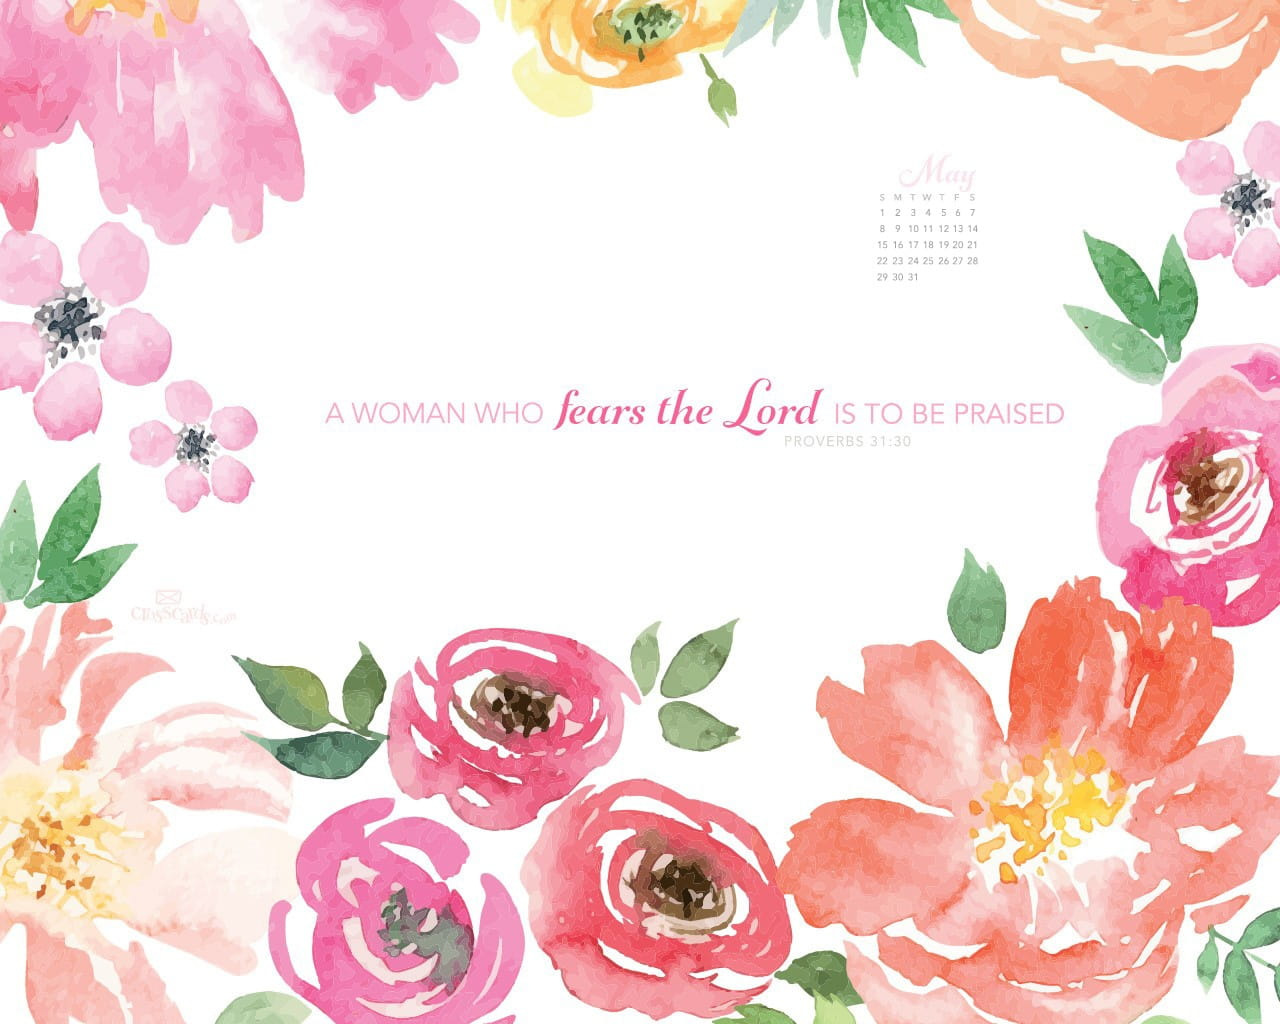 Fall Scripture Iphone Wallpaper May 2016 Proverbs 31 30 Desktop Calendar Free May Wallpaper